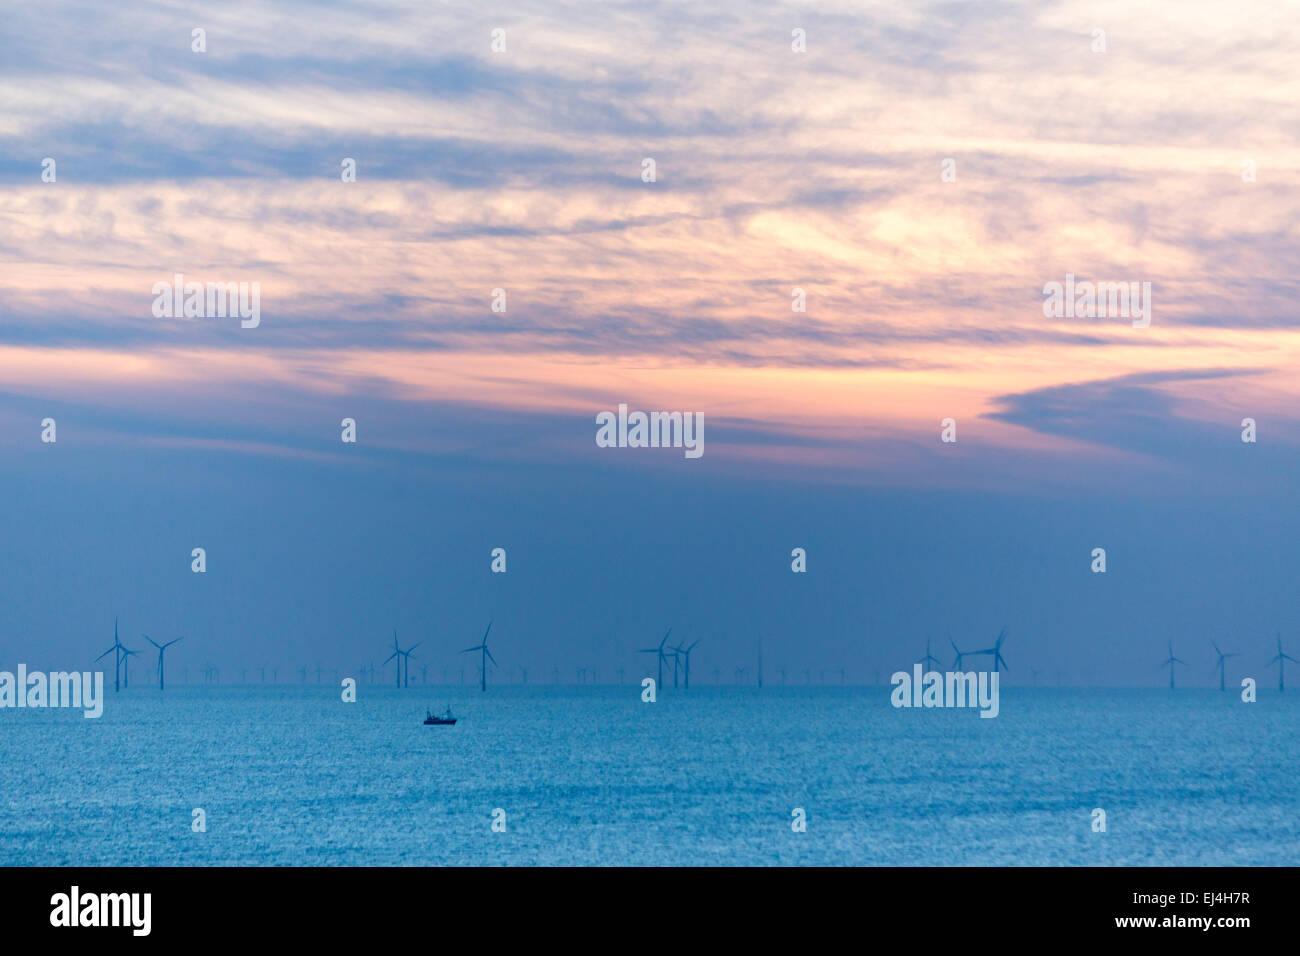 Egmond aan Zee, North Holland, Netherlands, off shore wind park, 18 kilometers of the coast, sunset - Stock Image